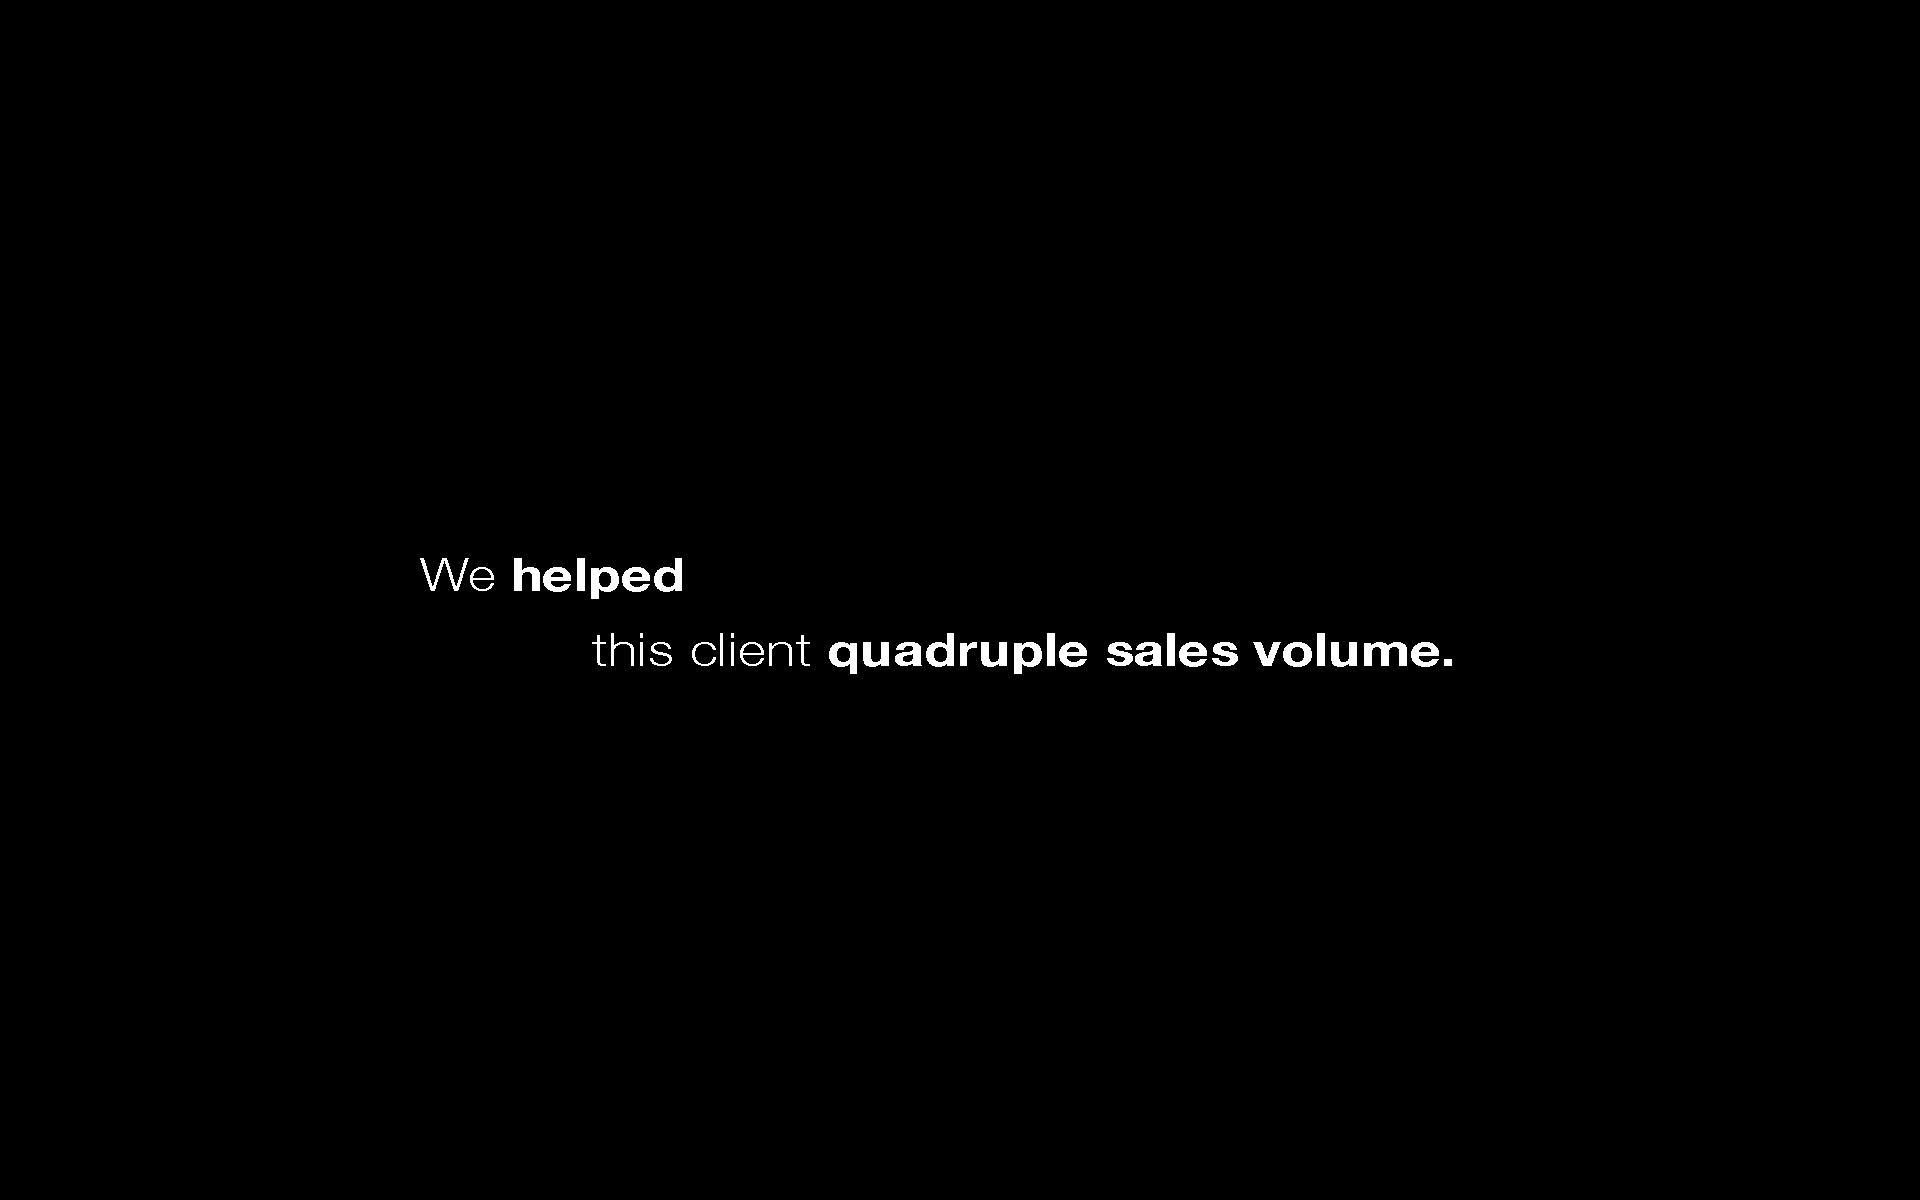 Web Quadruple sales volume.jpg